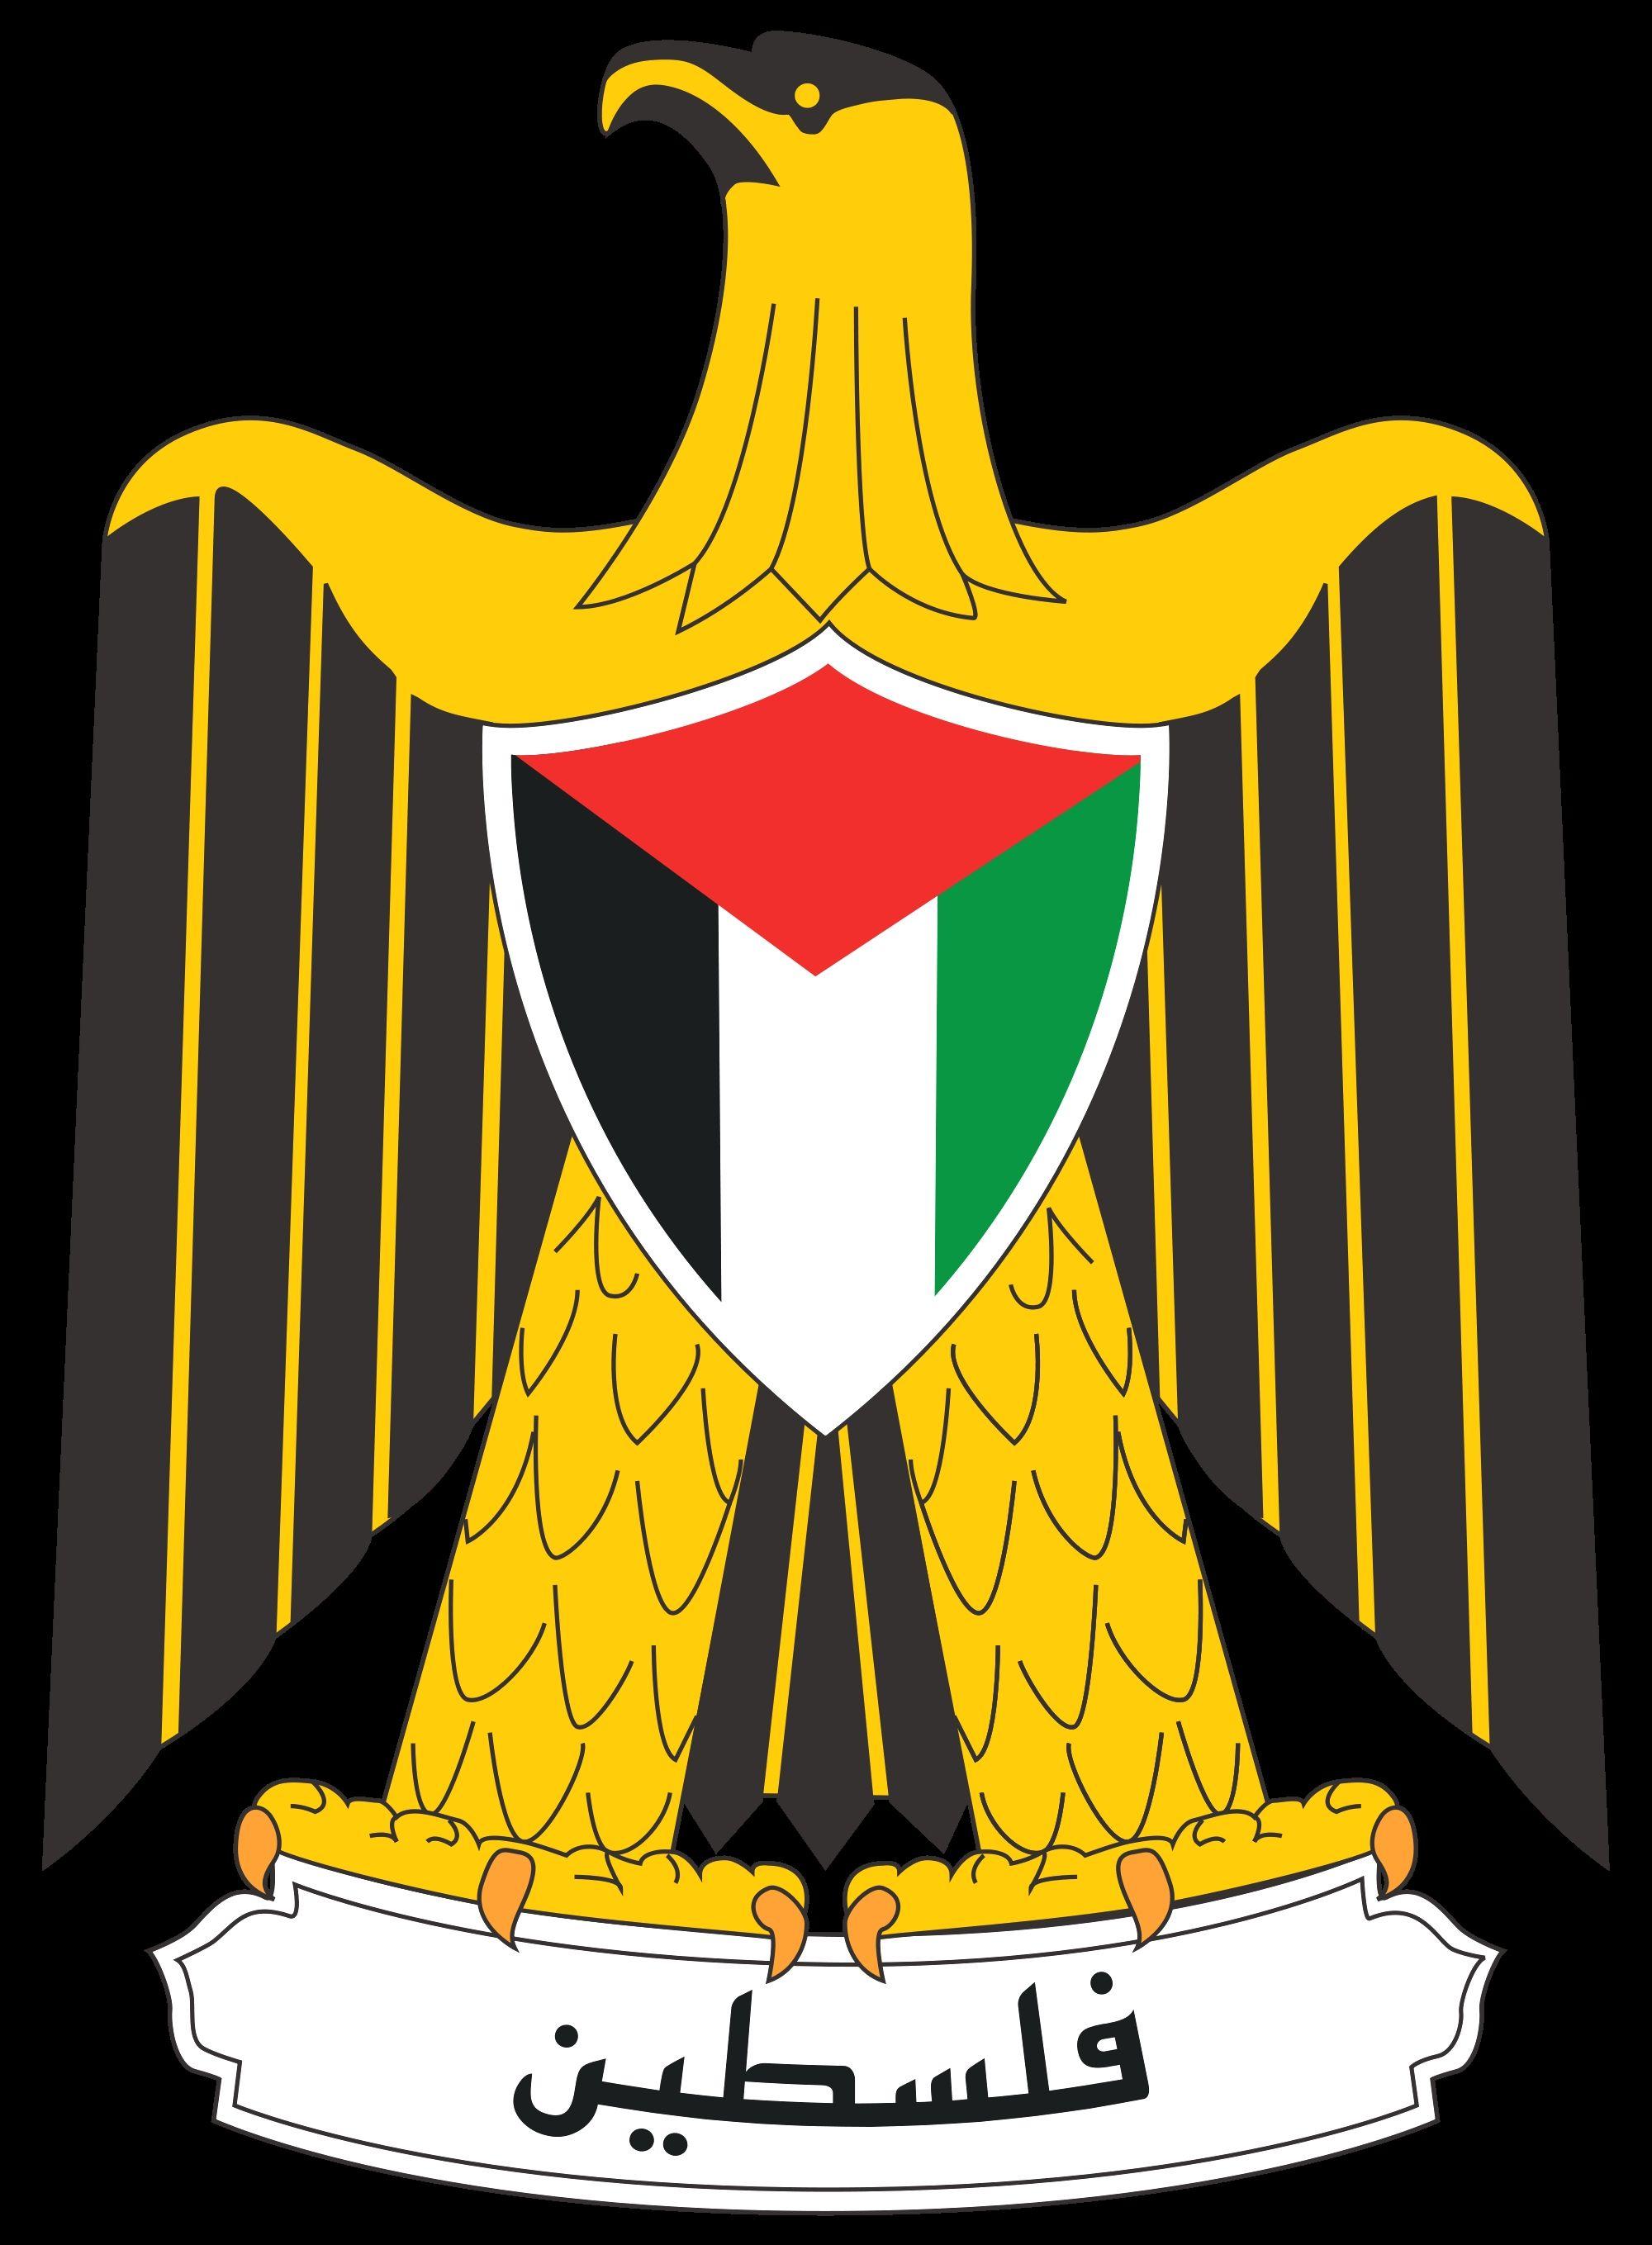 Nigeria Places To Know Dostup K Nashemu Blogu Gorazdo Bolshe Informacii Https Storelatina Com Nigeria Travelling Nijerya Niz Coat Of Arms Palestine Arms